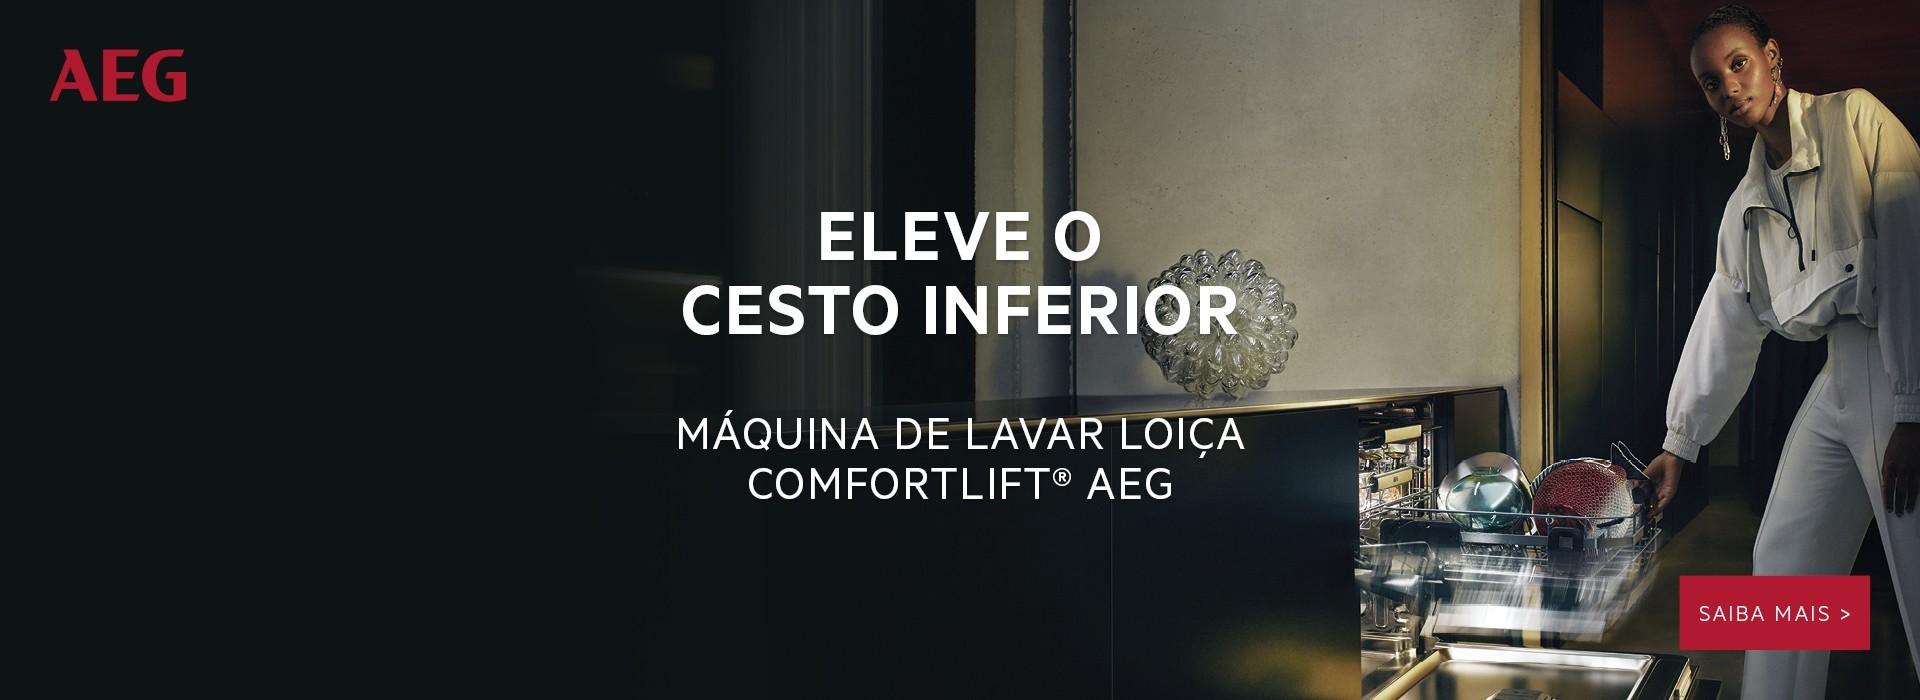 Banner AEG Loiça